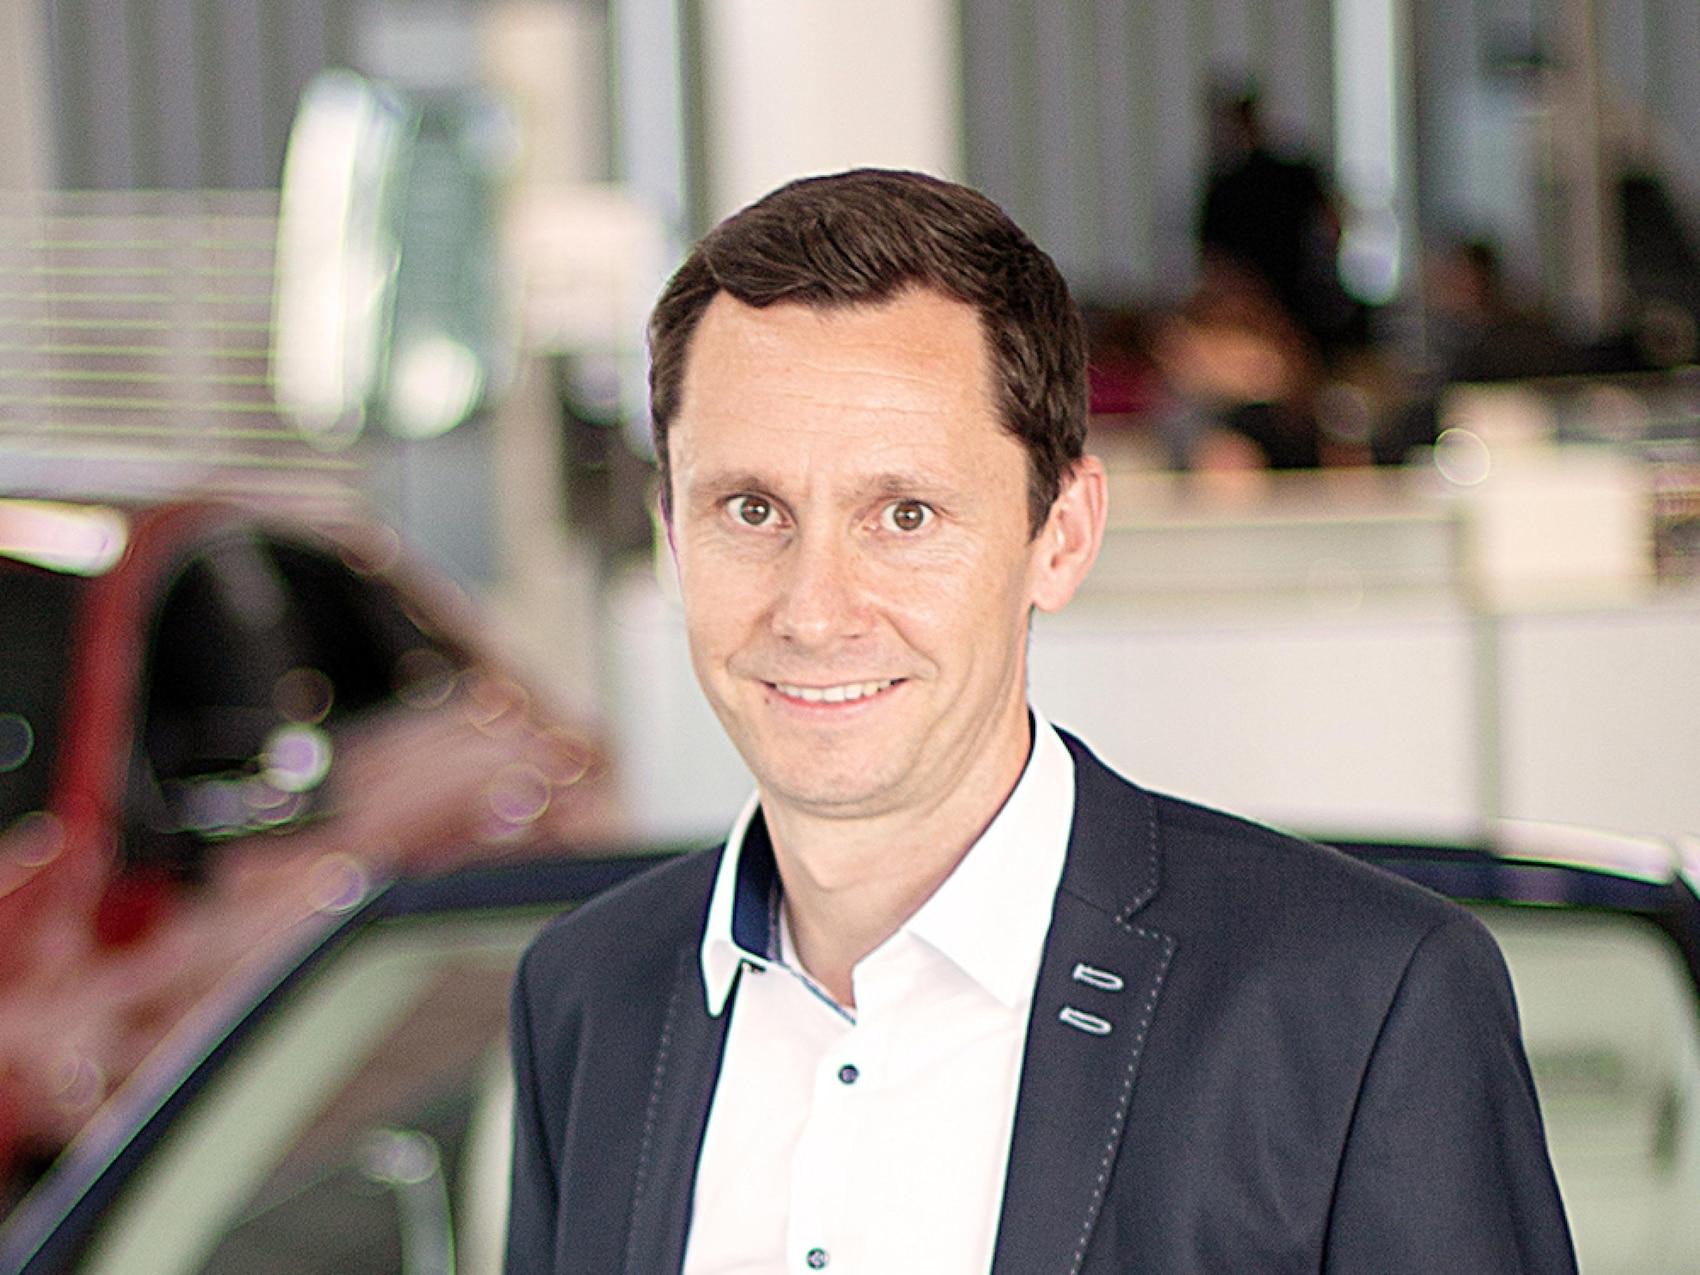 team-sc-Allgäu-Wöhr-Karl Heinz